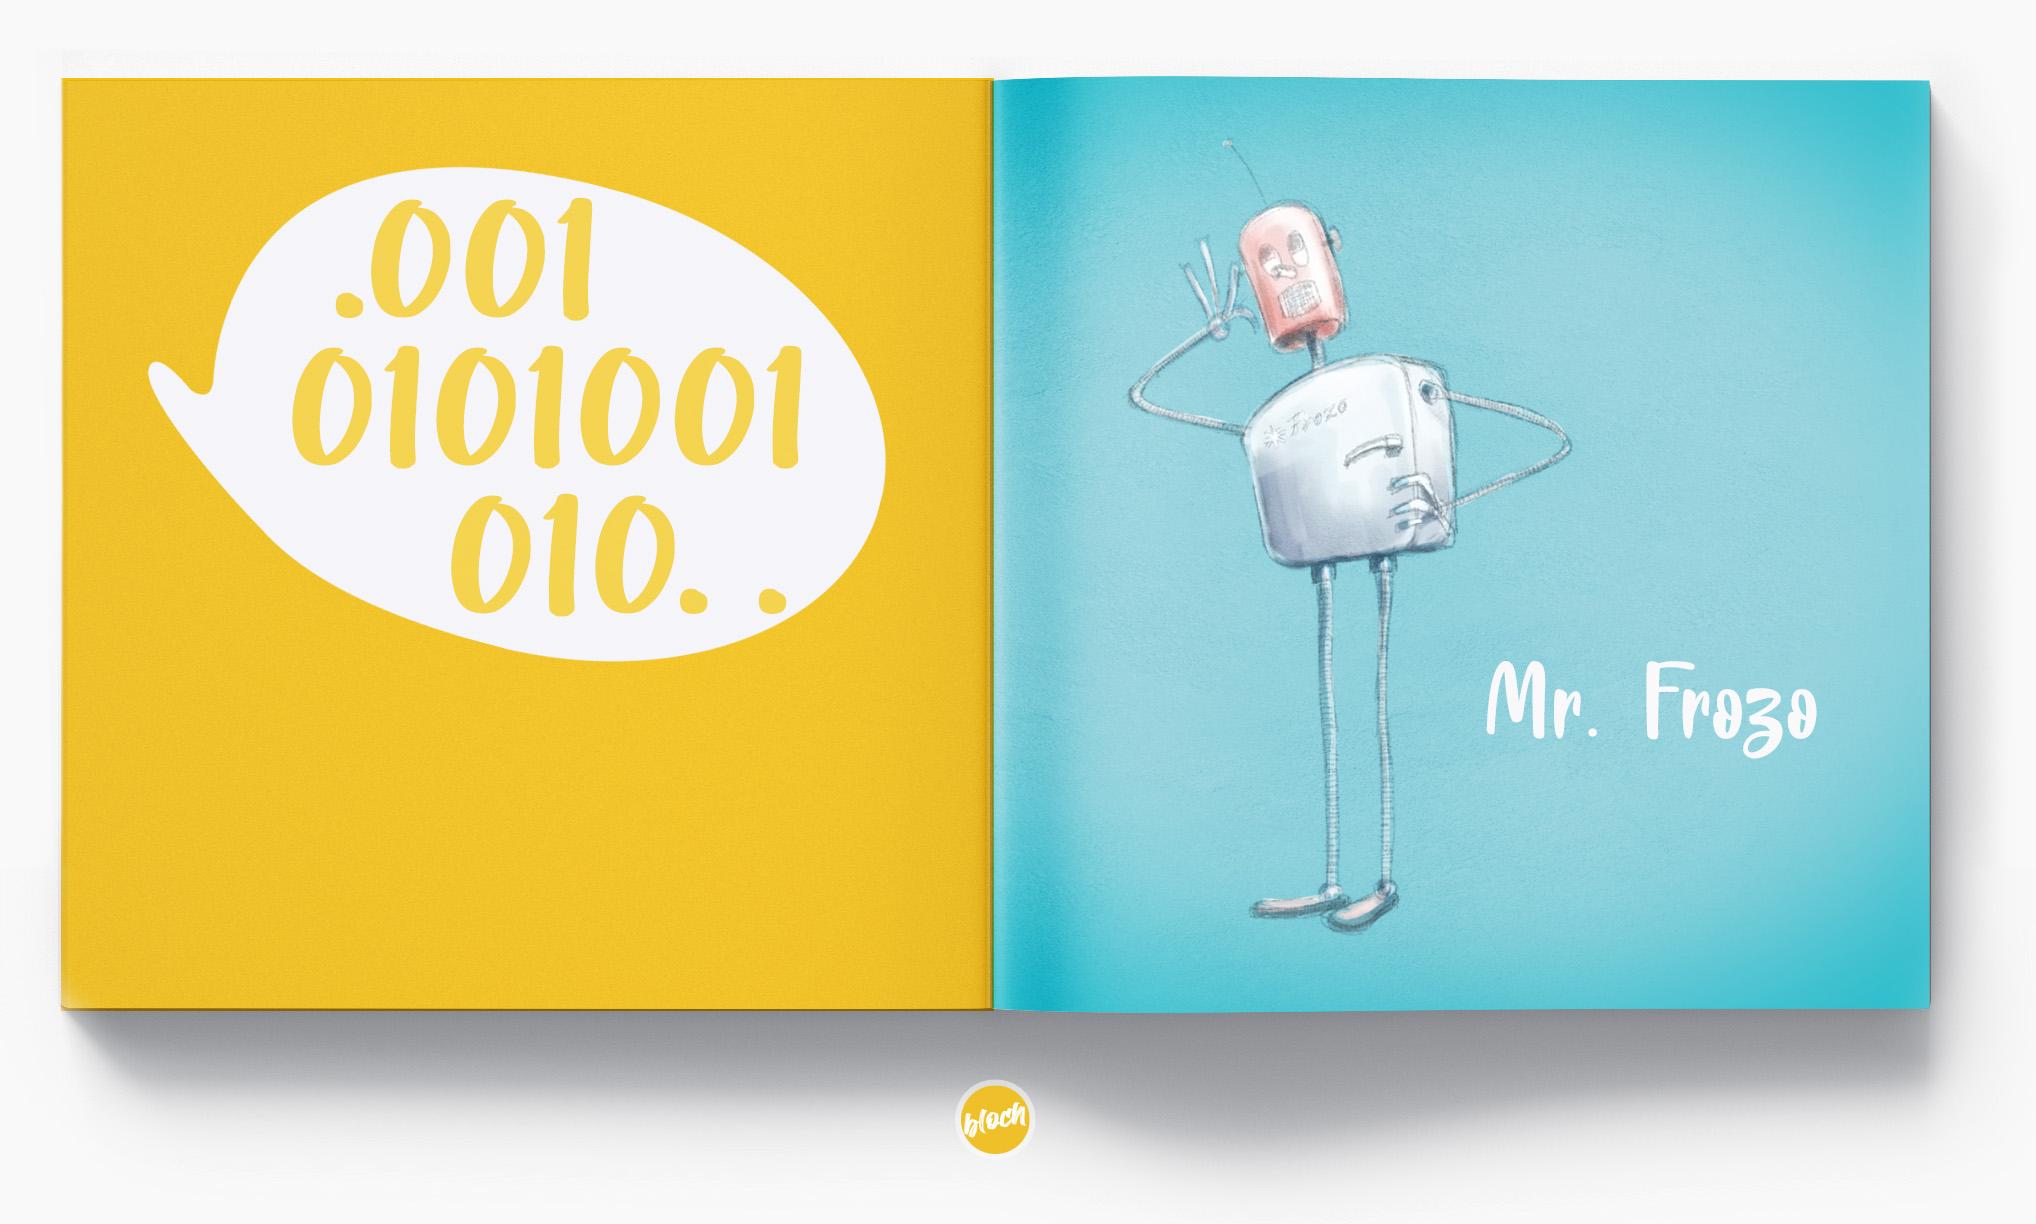 rysunki ilustracje reklamowe storyboard design digital draw, ilustracja, rysunek - digital draw, concept art, Robot Mr. Frozo